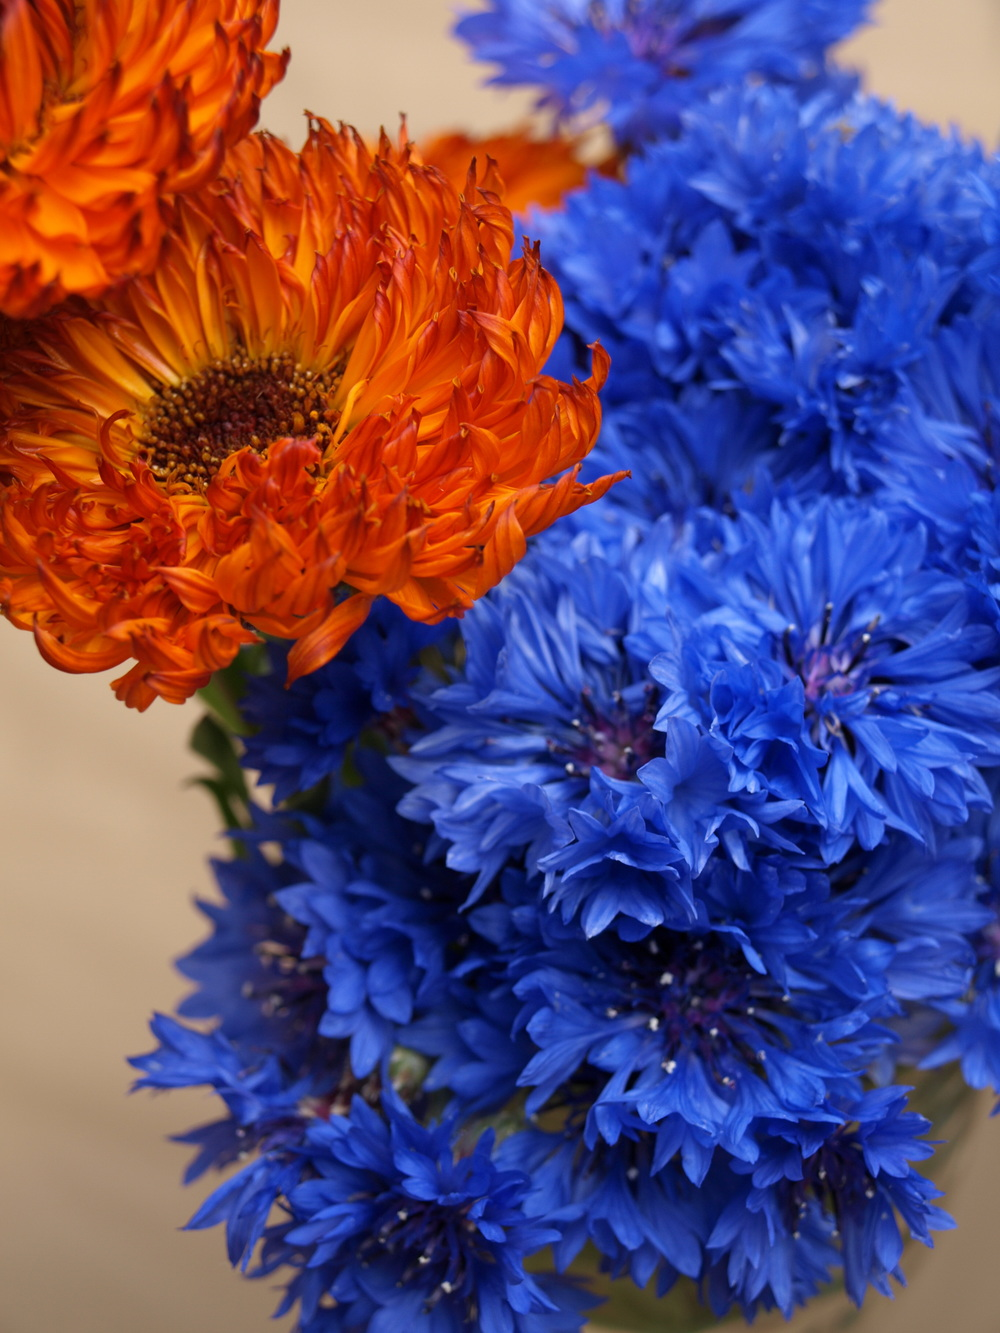 Corn Flowers and Calendulas